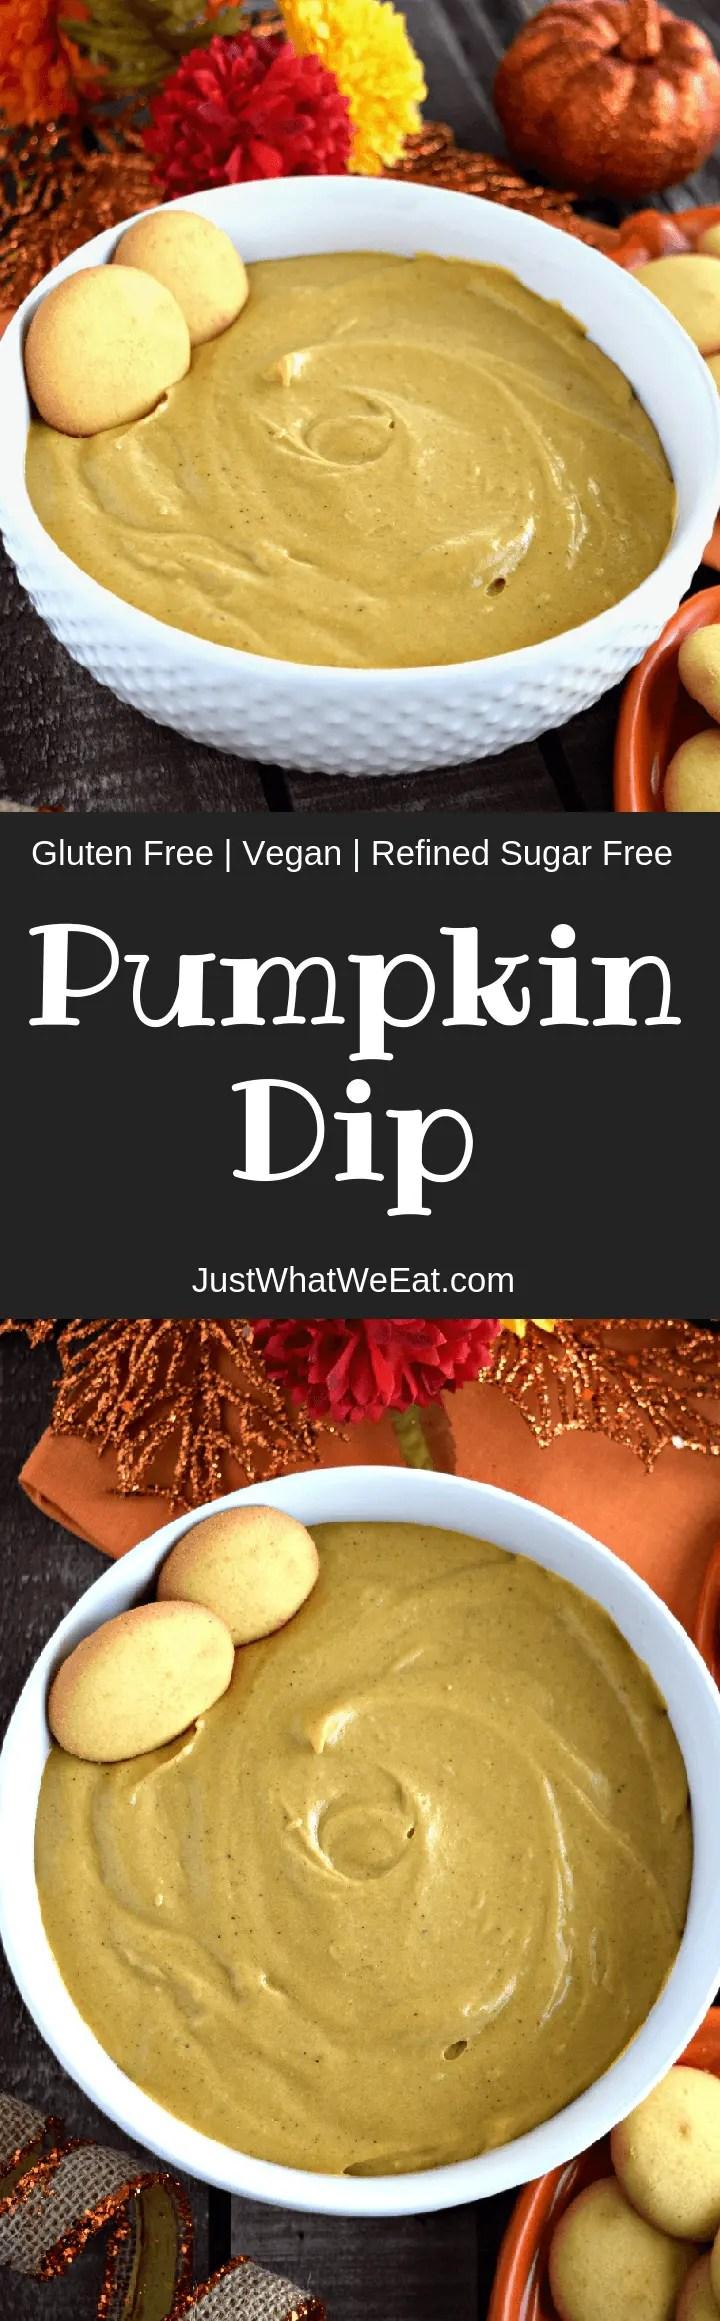 Pumpkin Dip - Gluten Free & Vegan